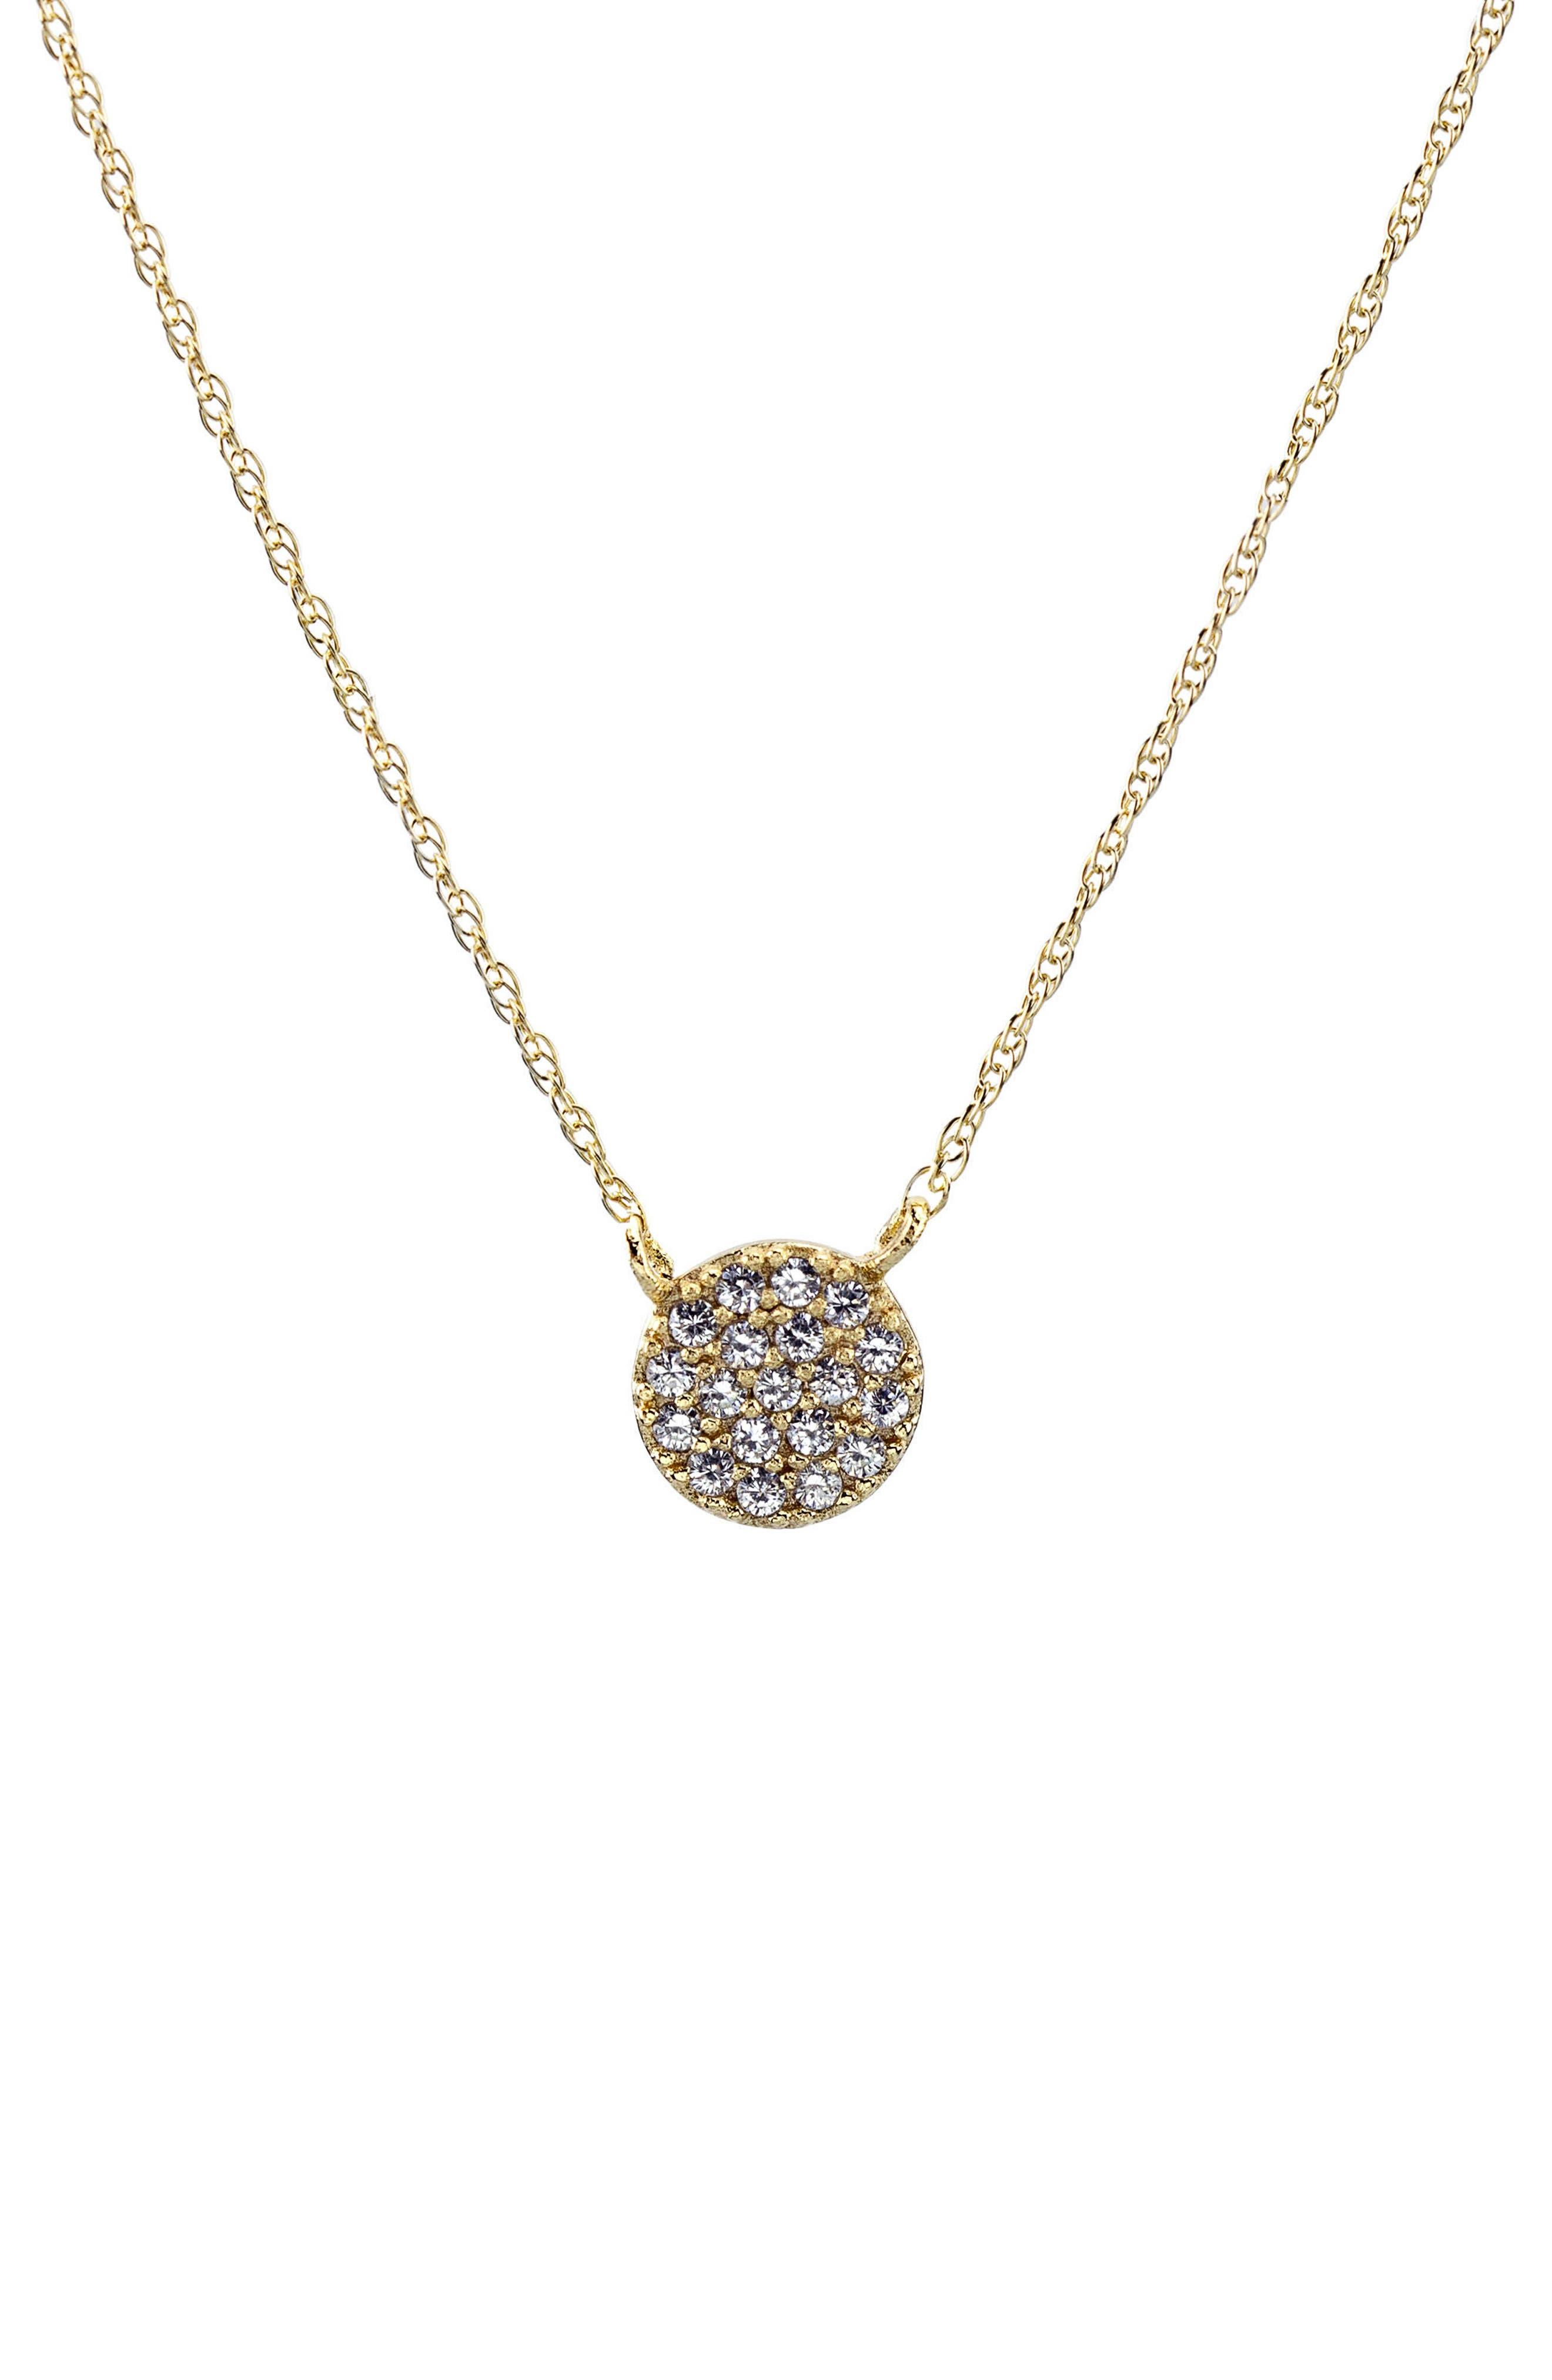 Main Image - Kris Nations Pavé Round Charm Necklace